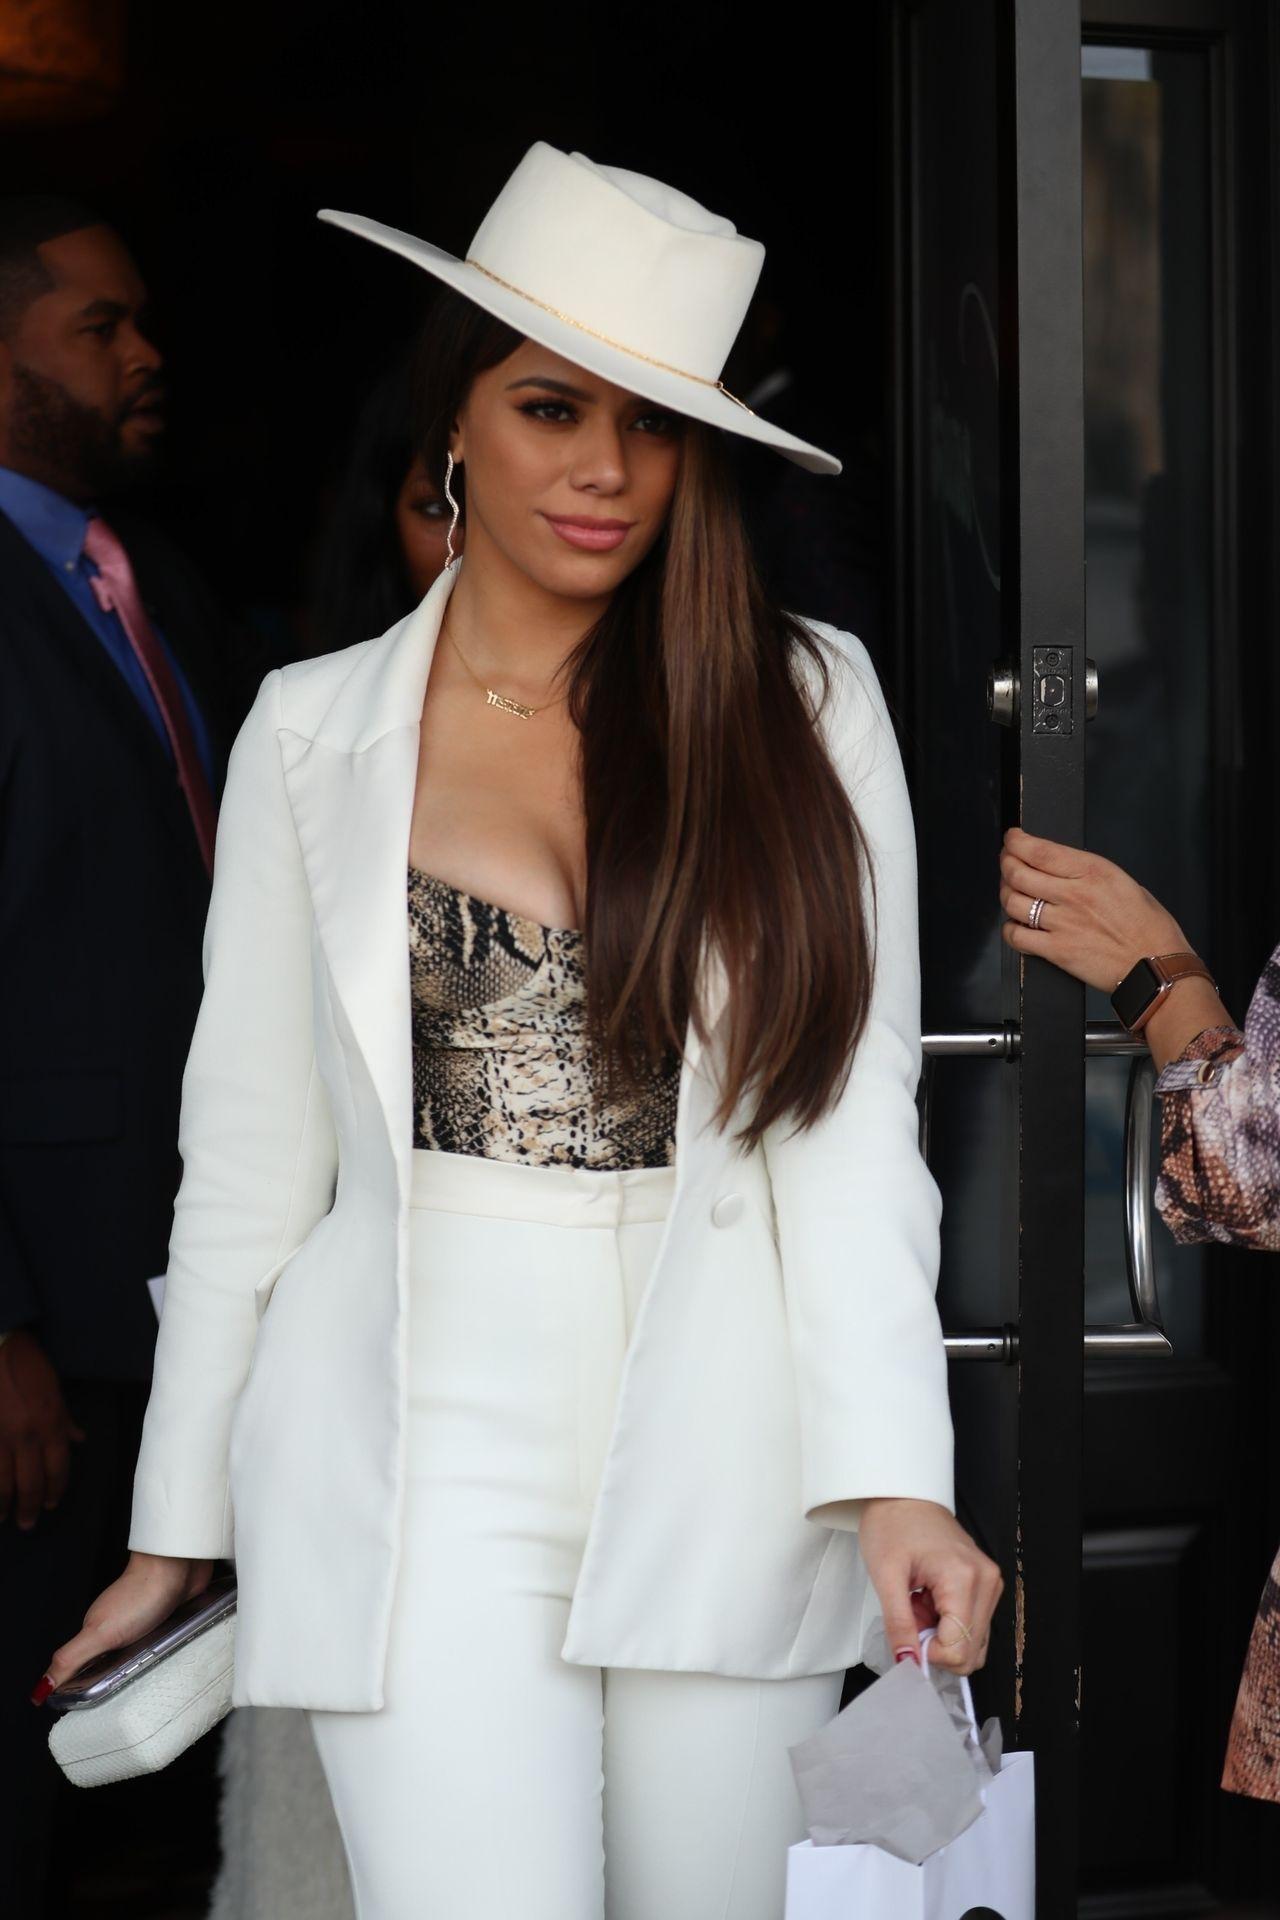 Dinah Jane Departs The Women In Harmony Pre Grammy Luncheon 0025